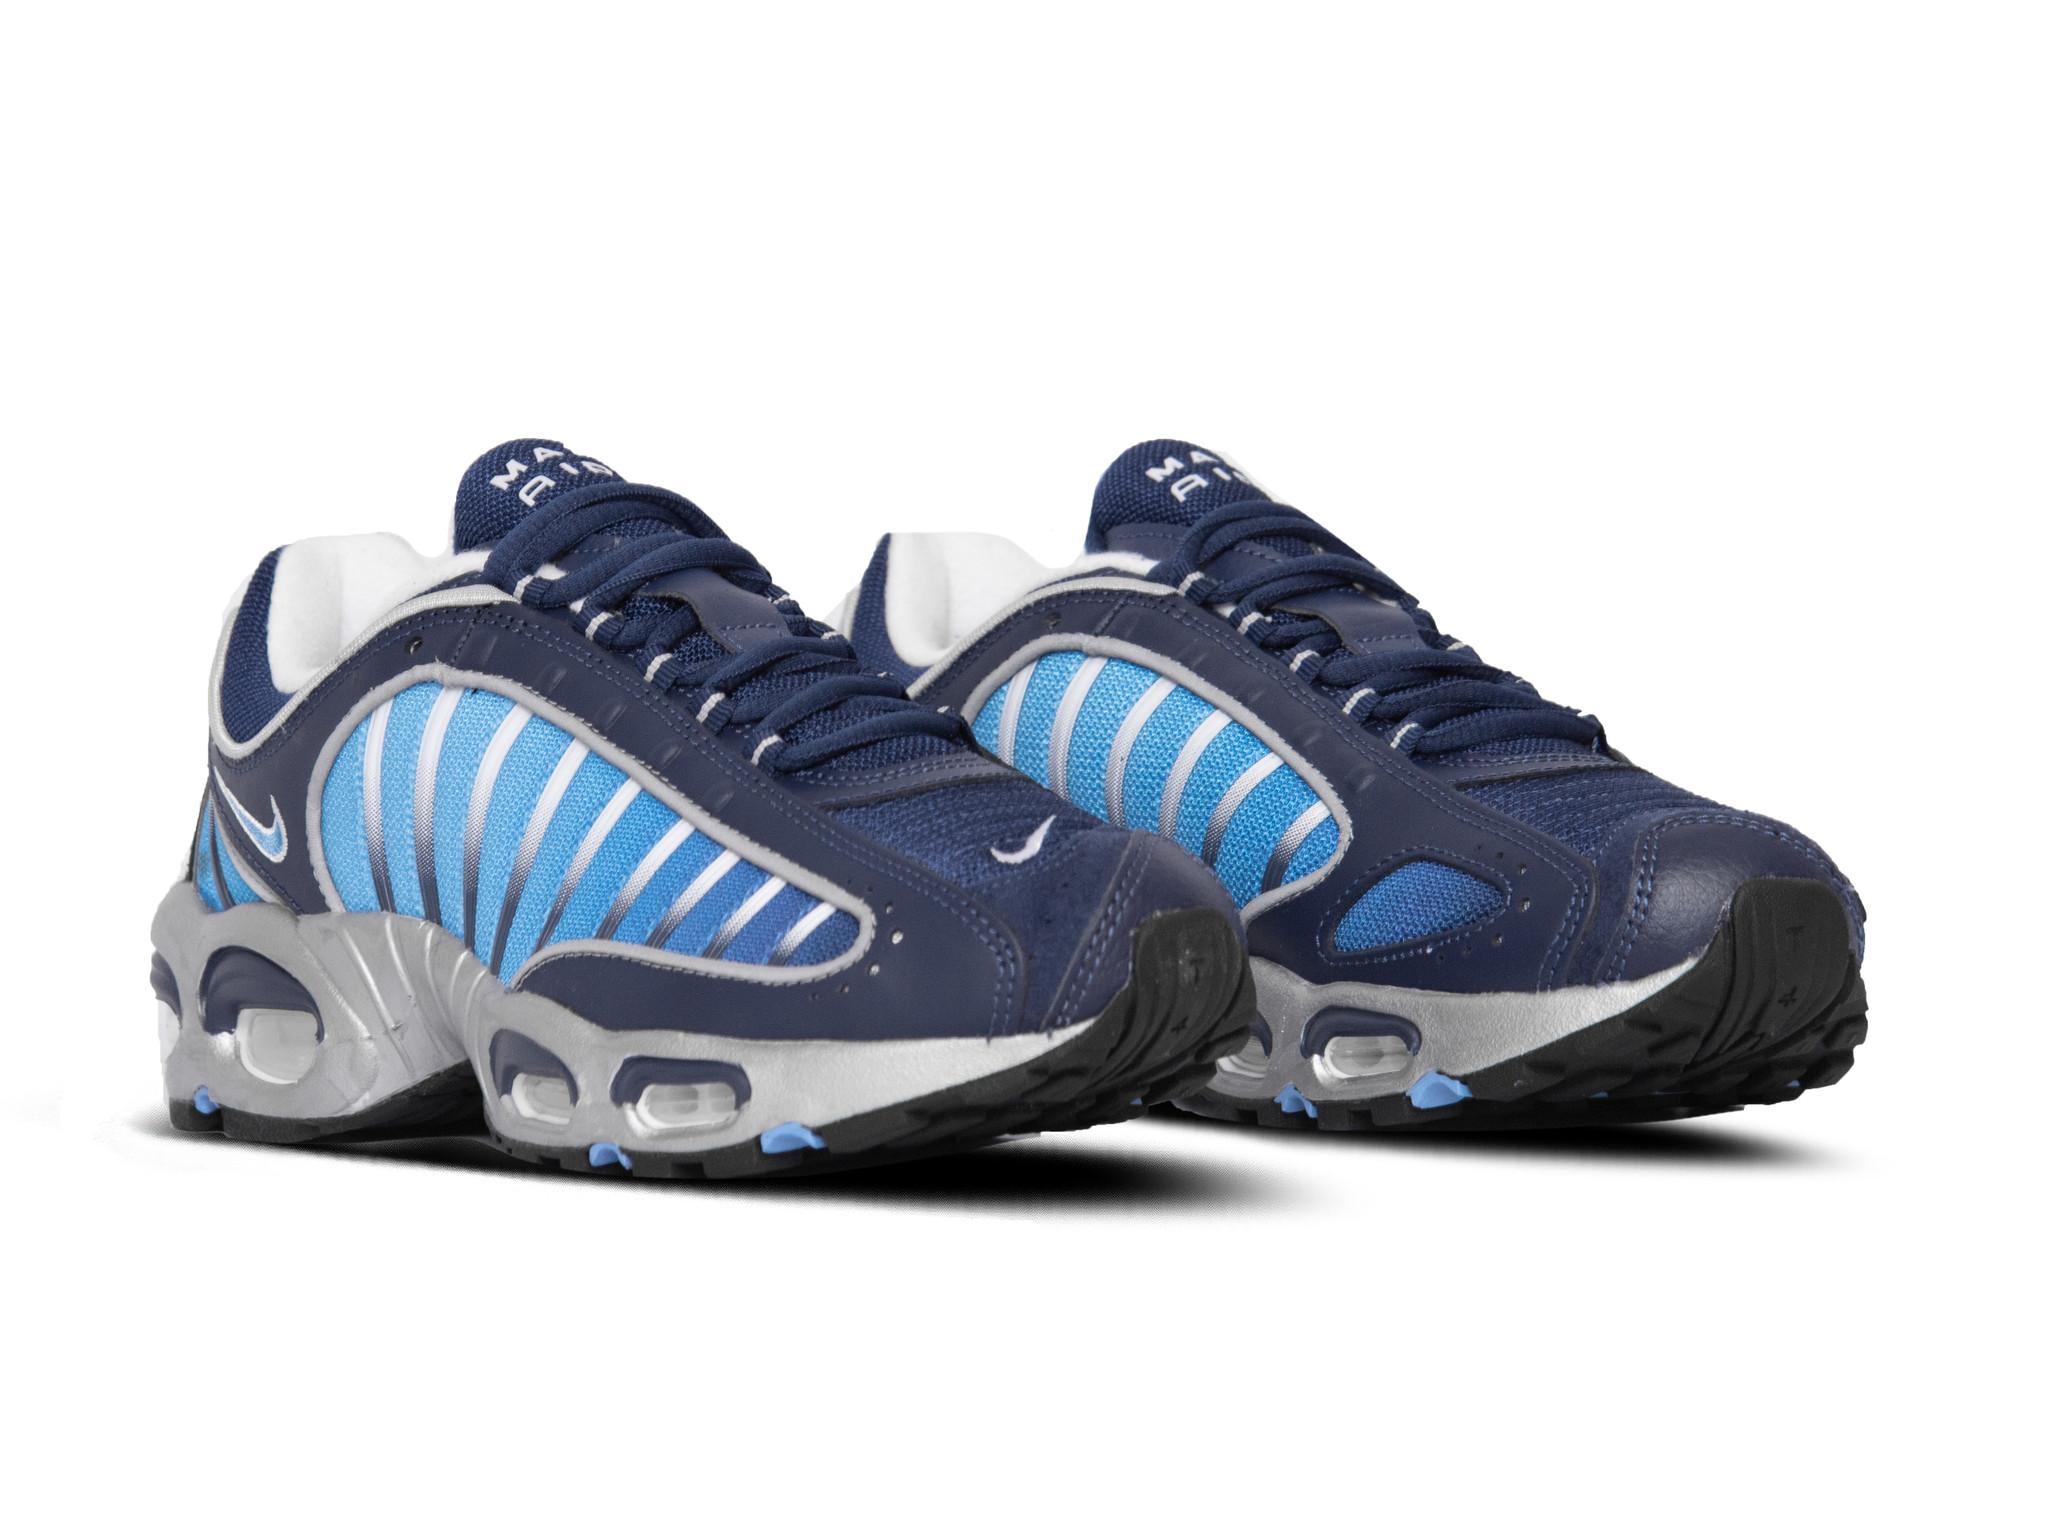 Air max Tailwind IV Blue Void University Blue White Black